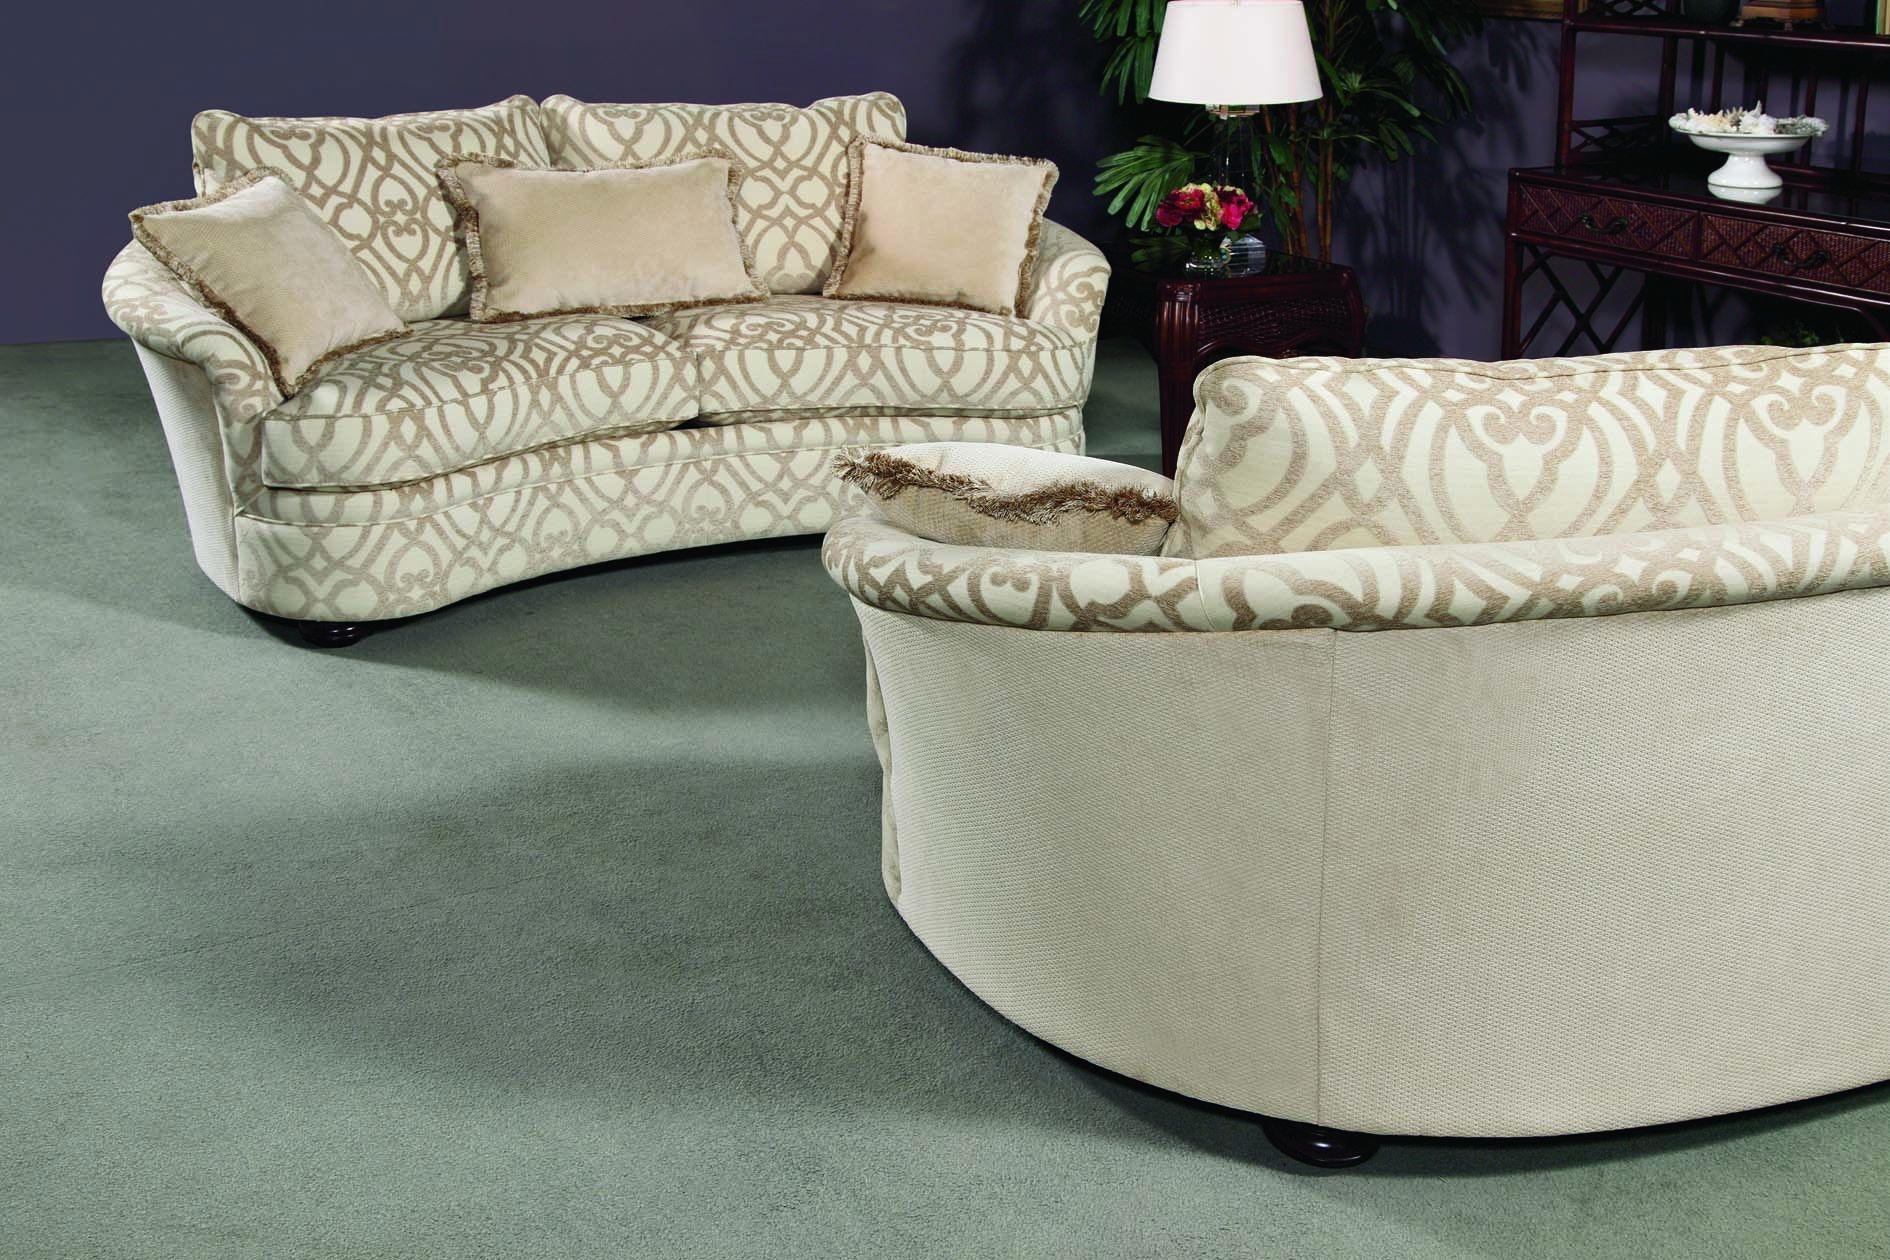 Braxton Culler Living Room Conversation Sofa 740 013 Bacons